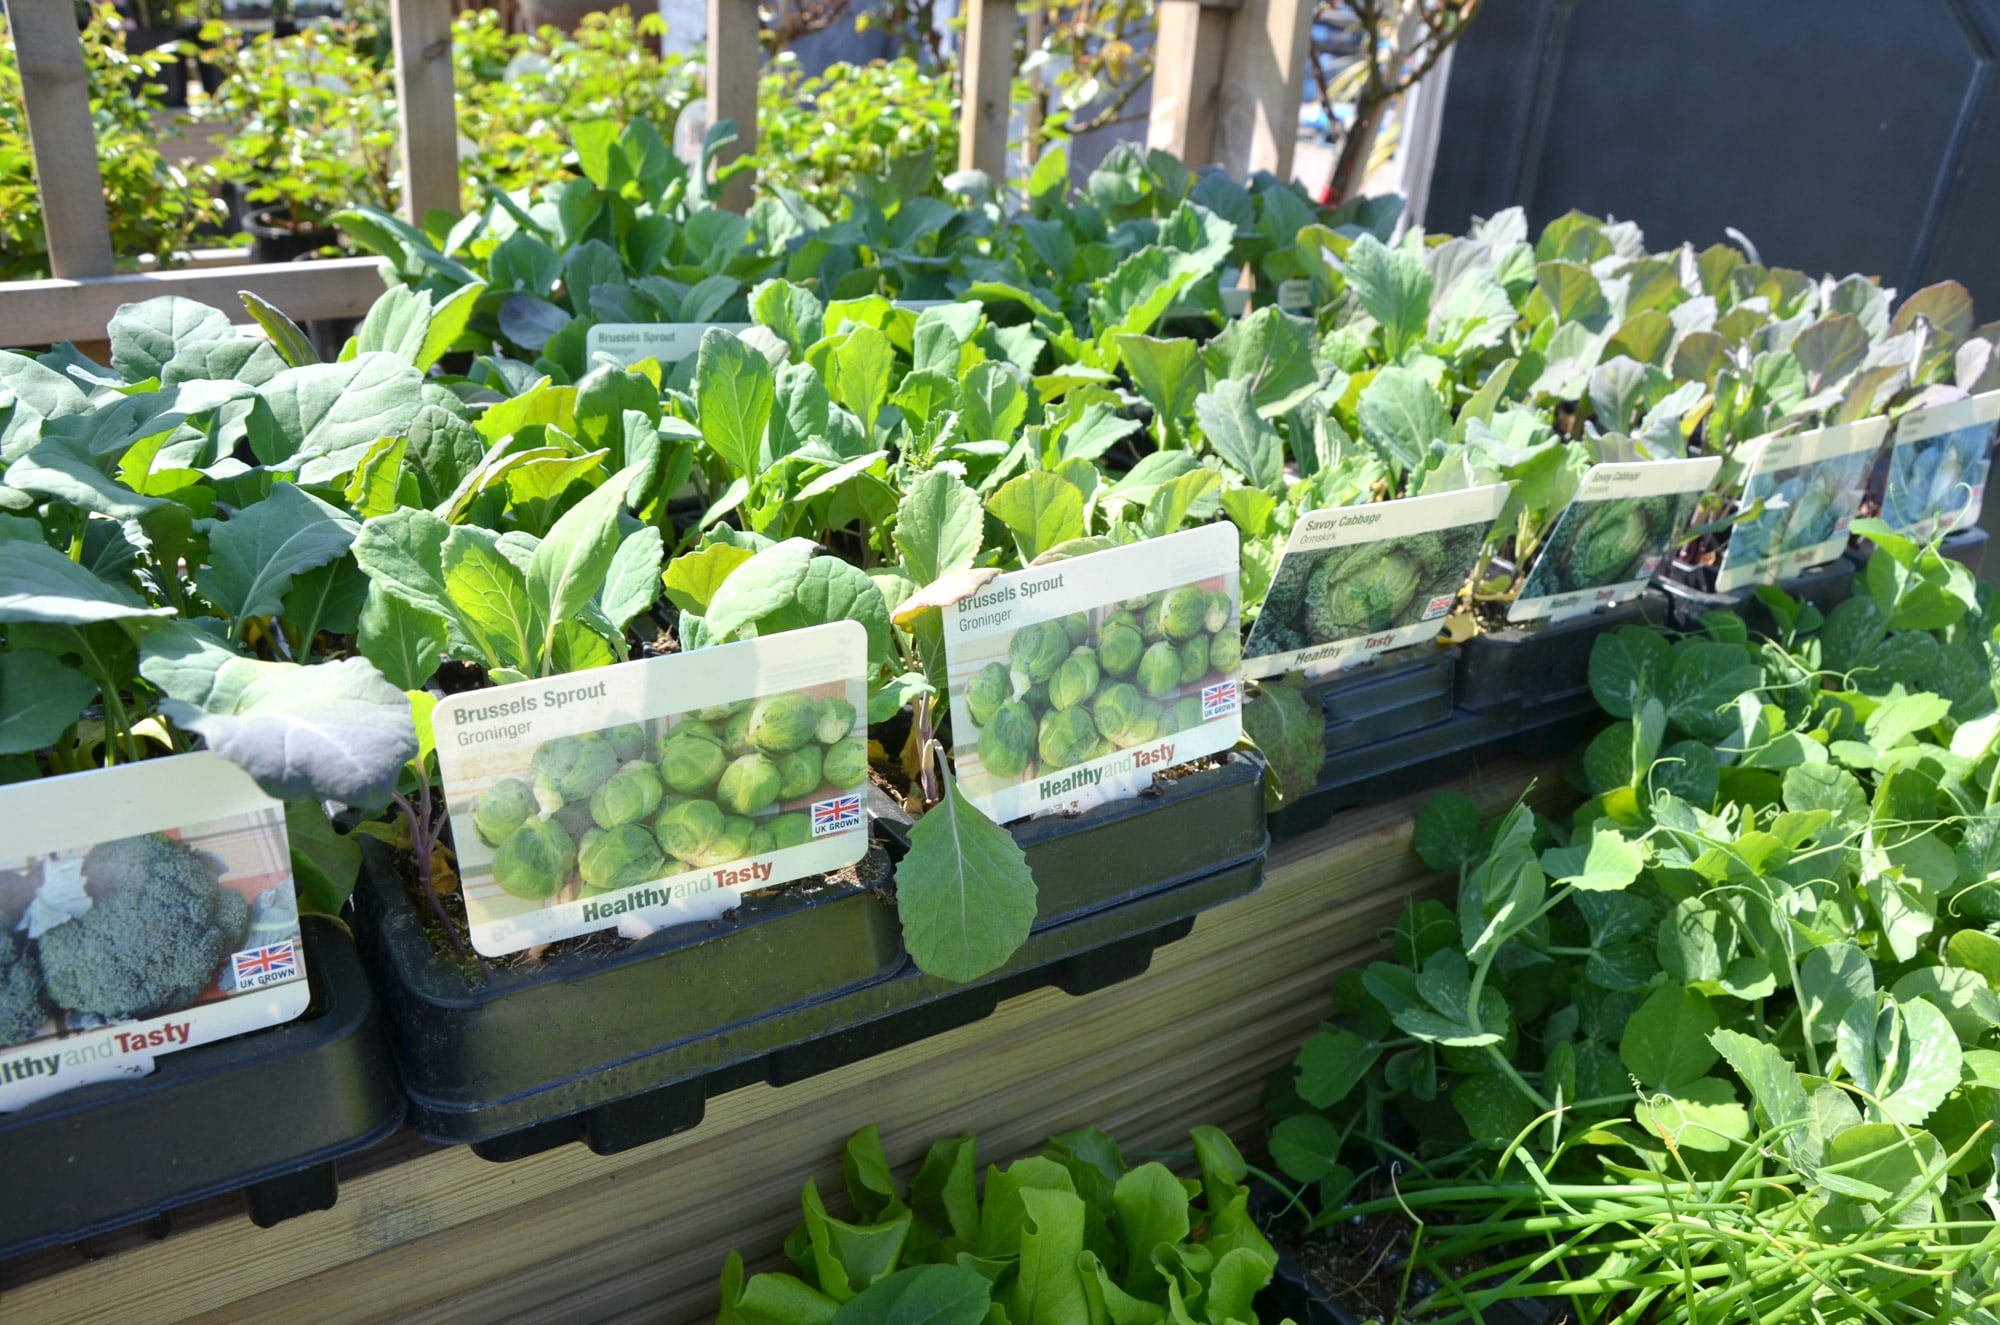 Lower-barn-gardencentre-peas-min.jpg